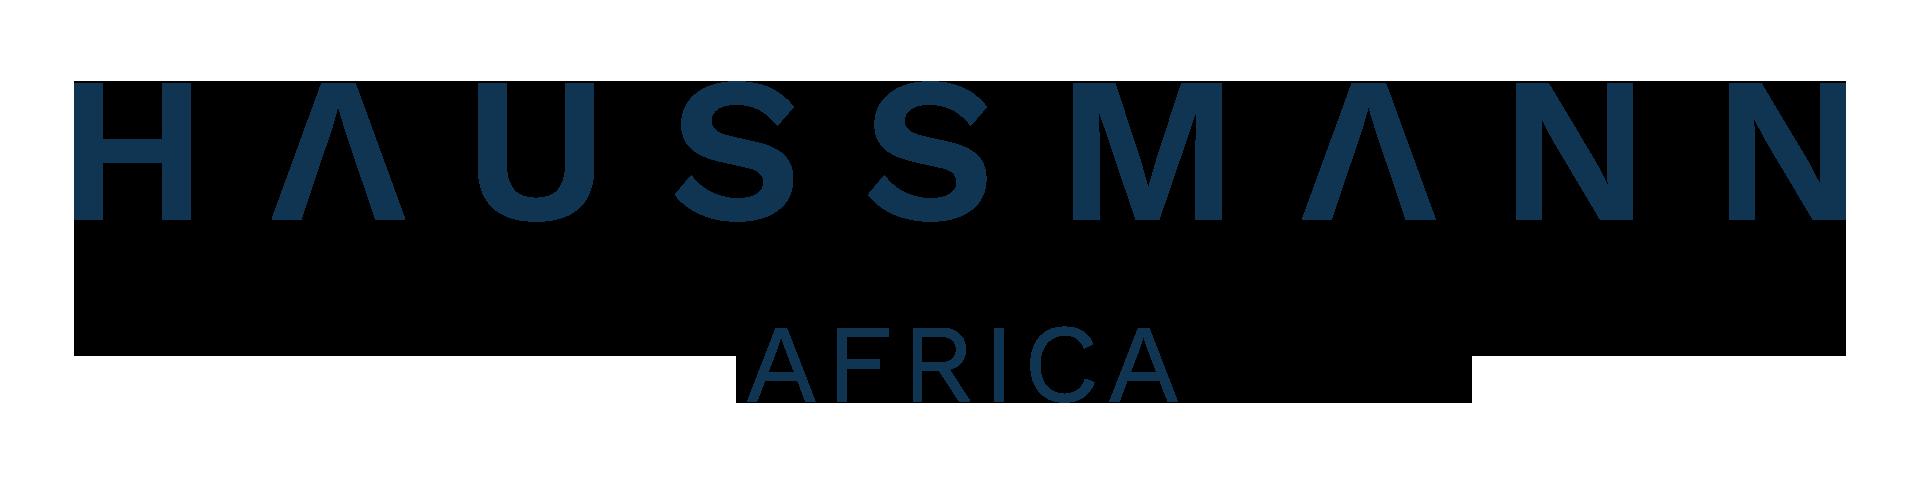 Haussman-Africa-Logo-Transparent